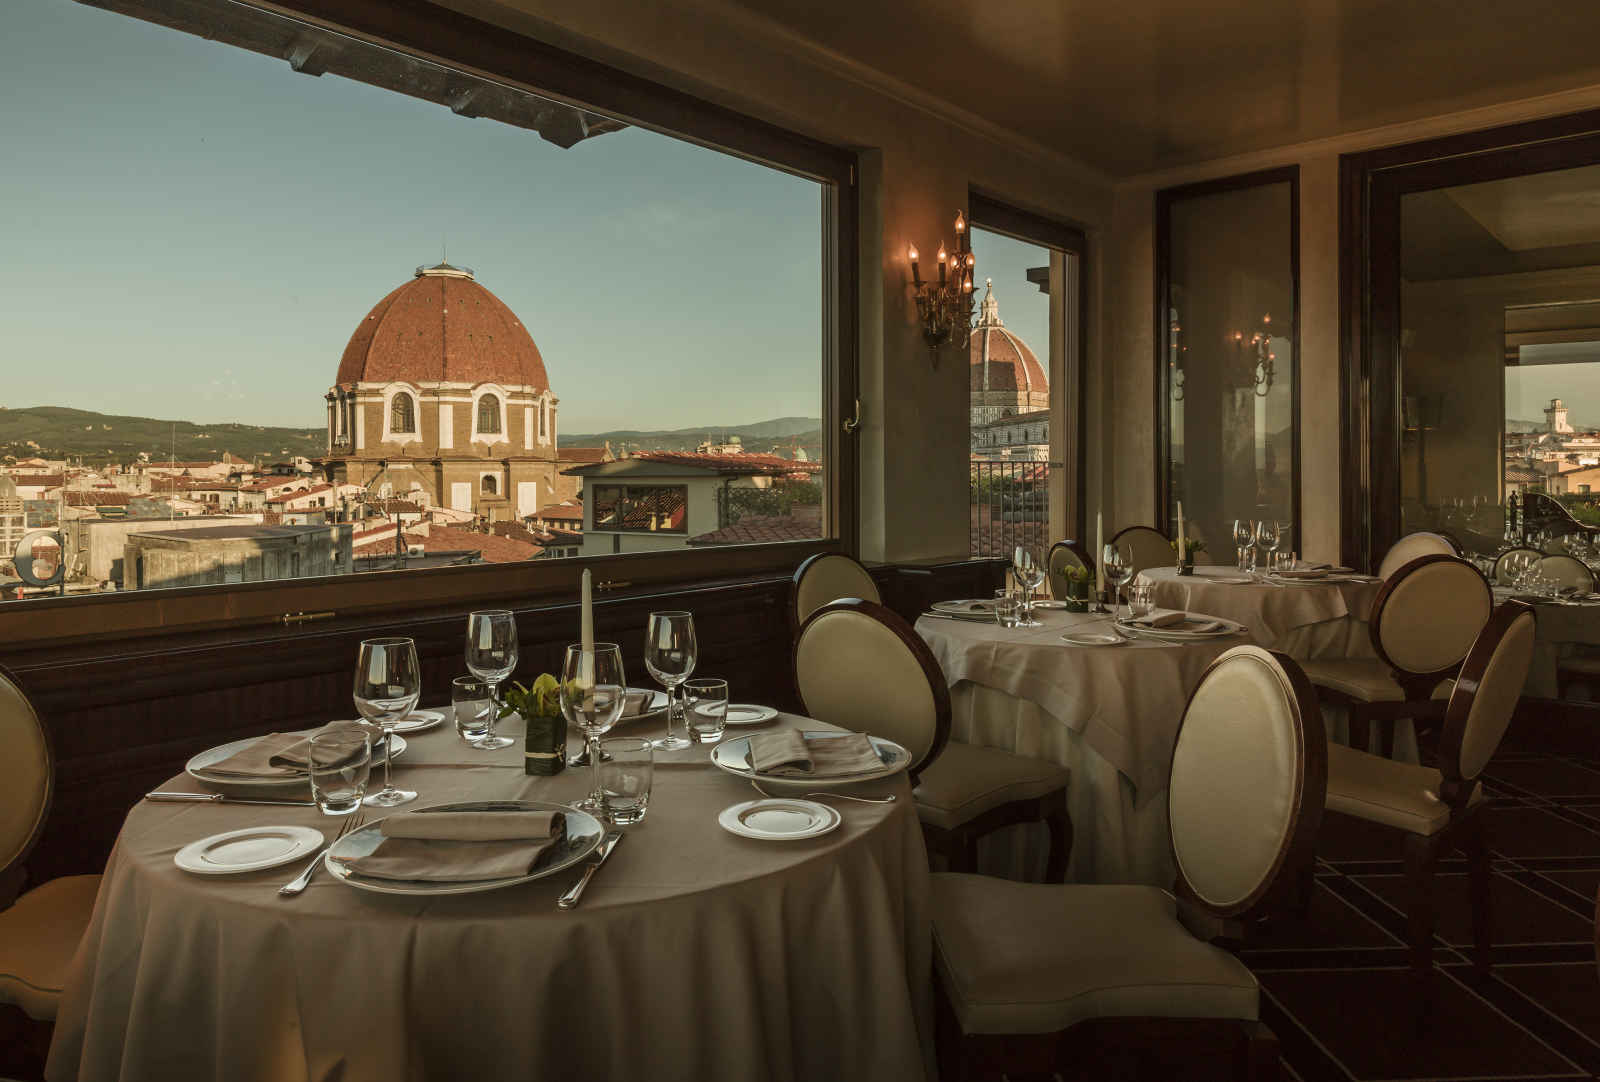 Séjour Italie - Grand Hotel Baglioni - 4*